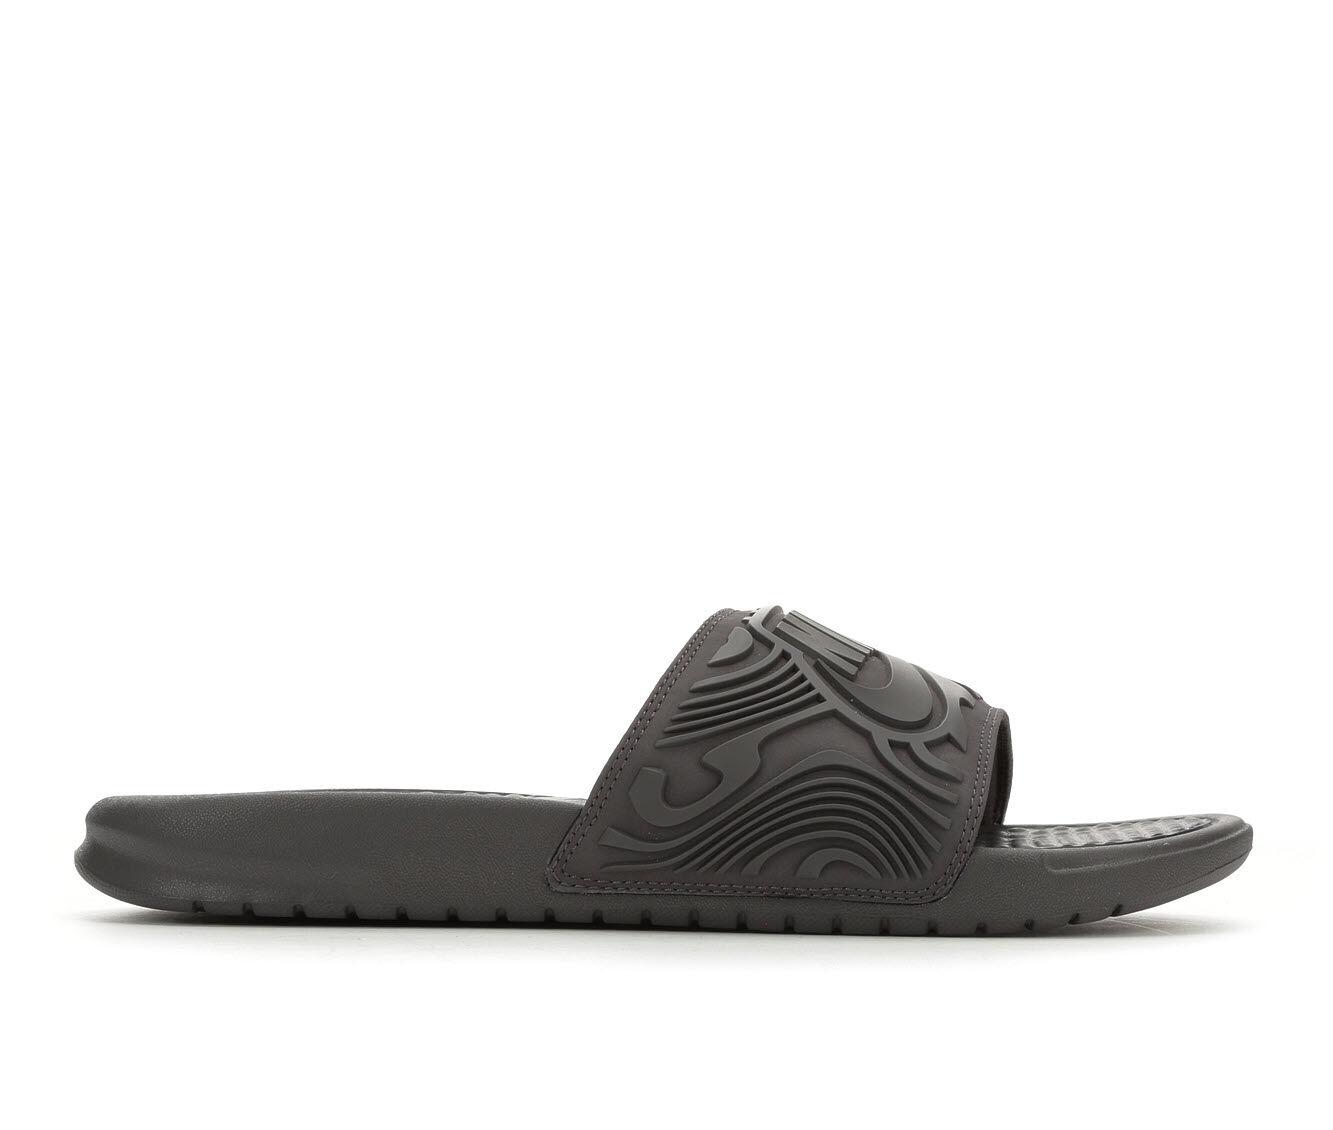 purchase cheap Men's Nike Benassi JDI SE Sport Slides Grey/Black